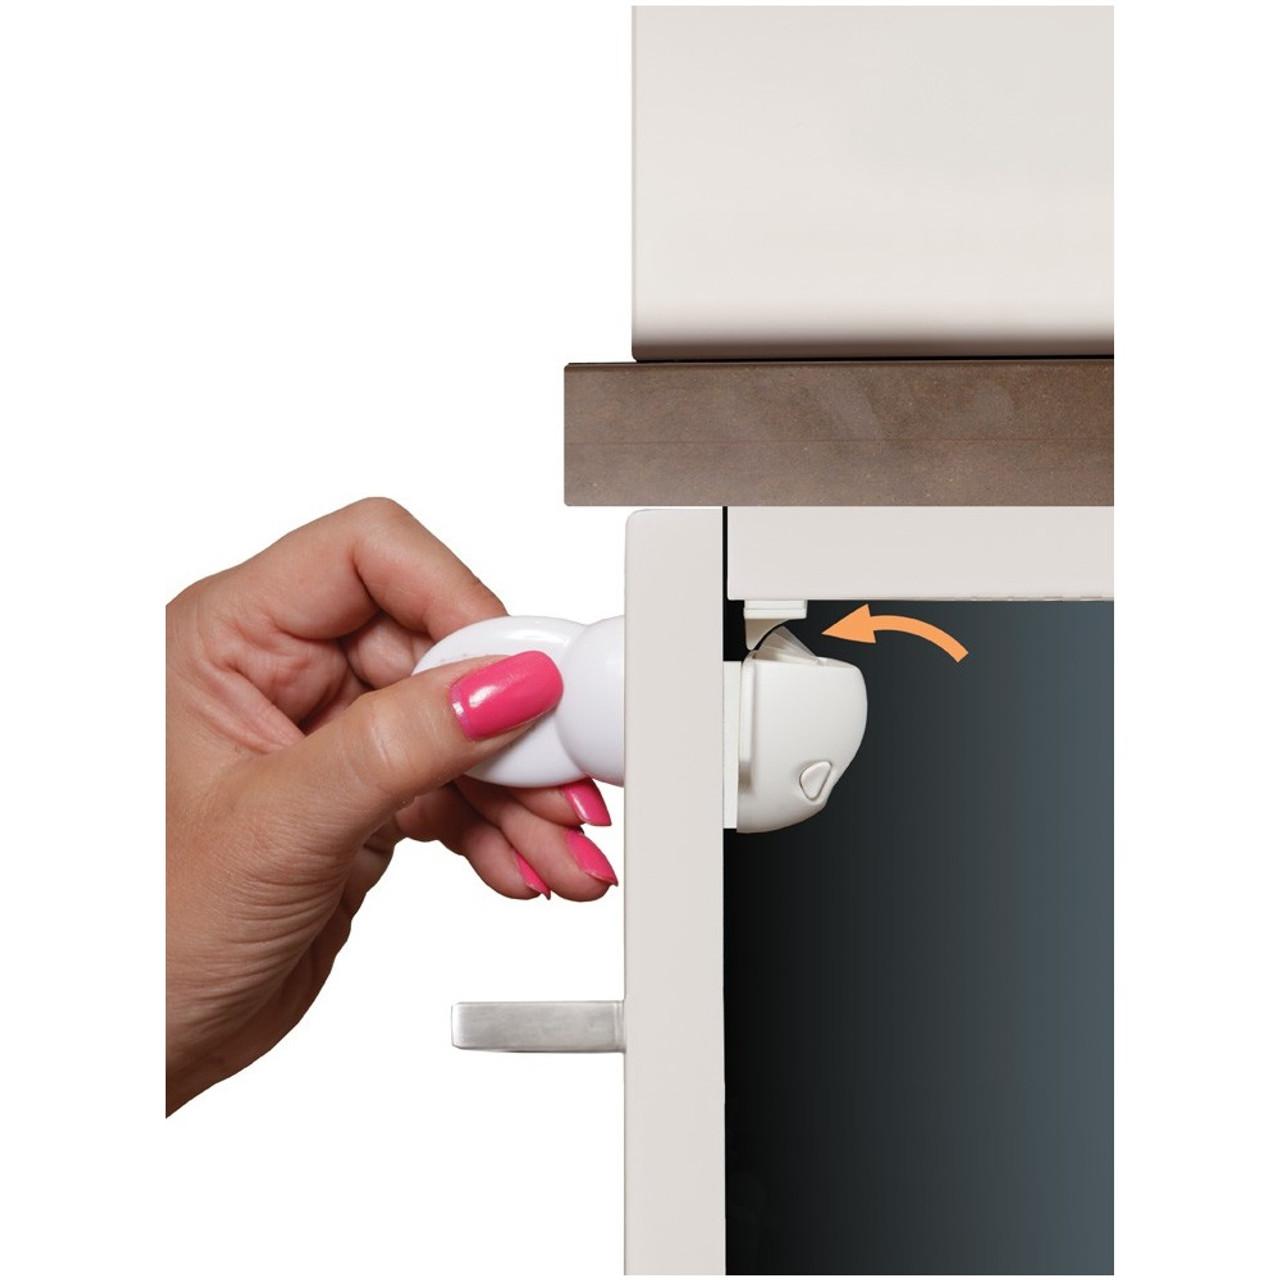 Dreambaby Adhesive Mag Lock - 2 Locks and 1 Key